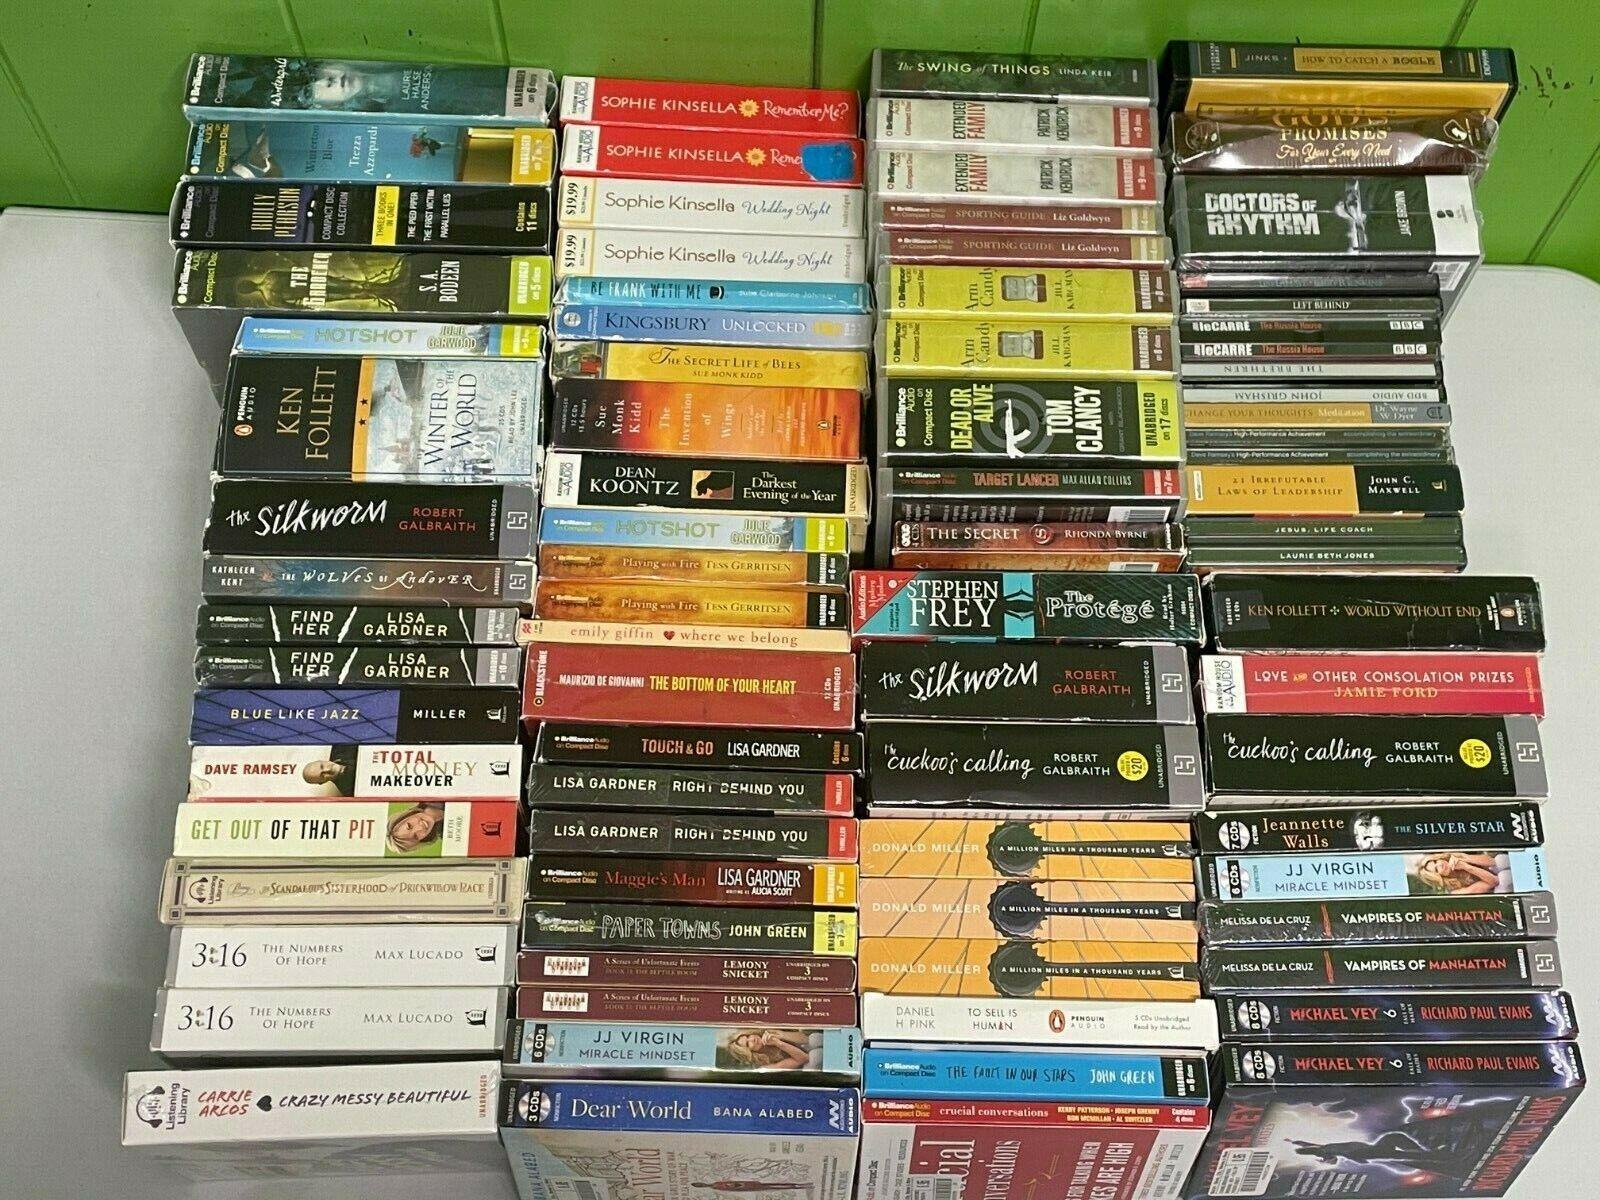 Audiobook LOT Books On CD Wholesale Audio Book Bulk NAAB4 - $10.50